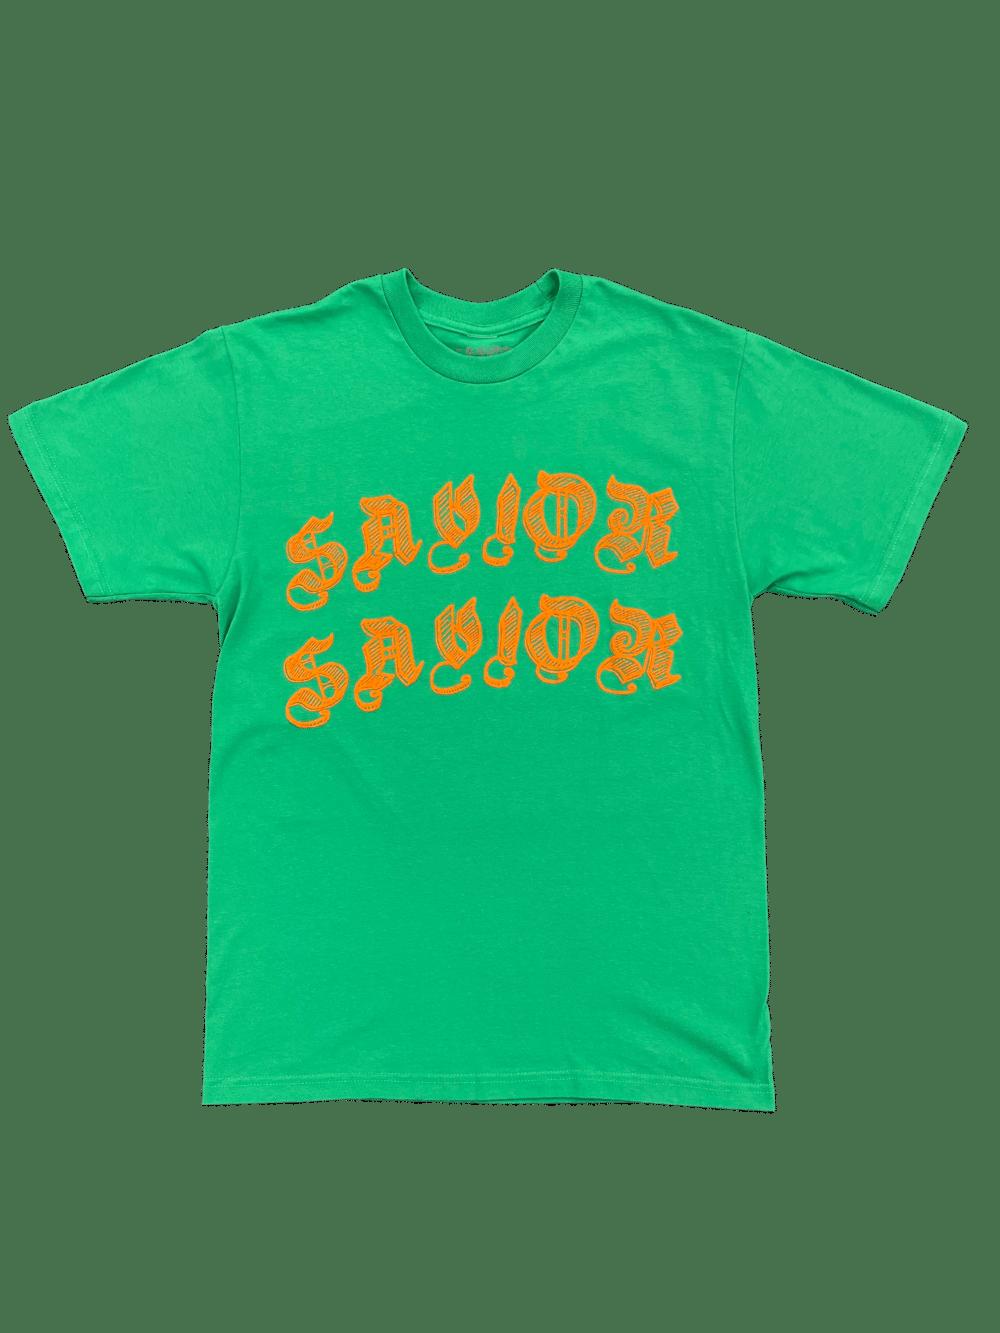 Image of Savior Worldwide Tee- Green